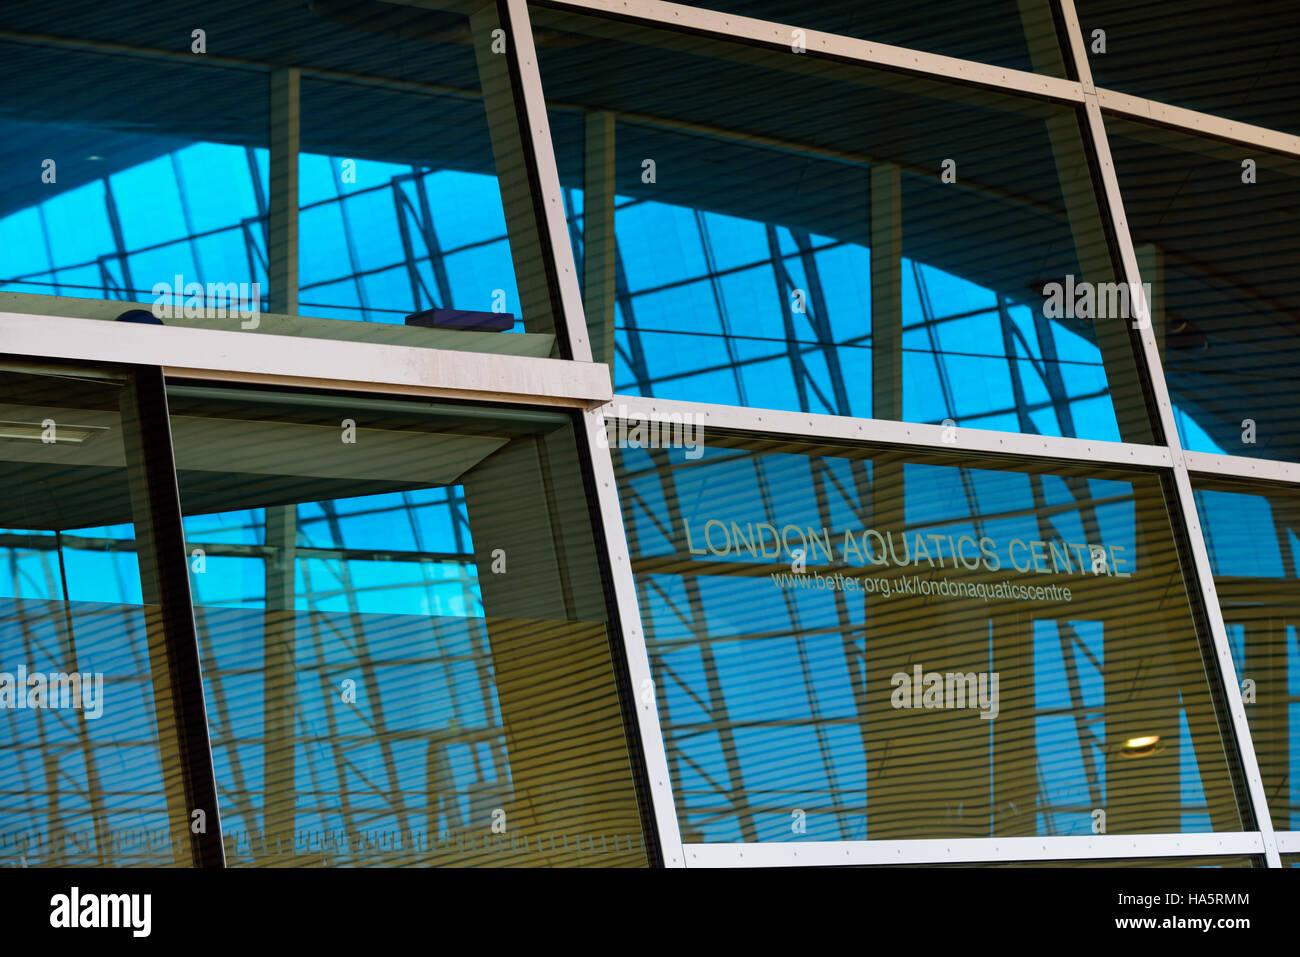 London Aquatics Centre, Queen Elizabeth Olympic Park, Stratford, London E20, United Kingdom - Stock Image